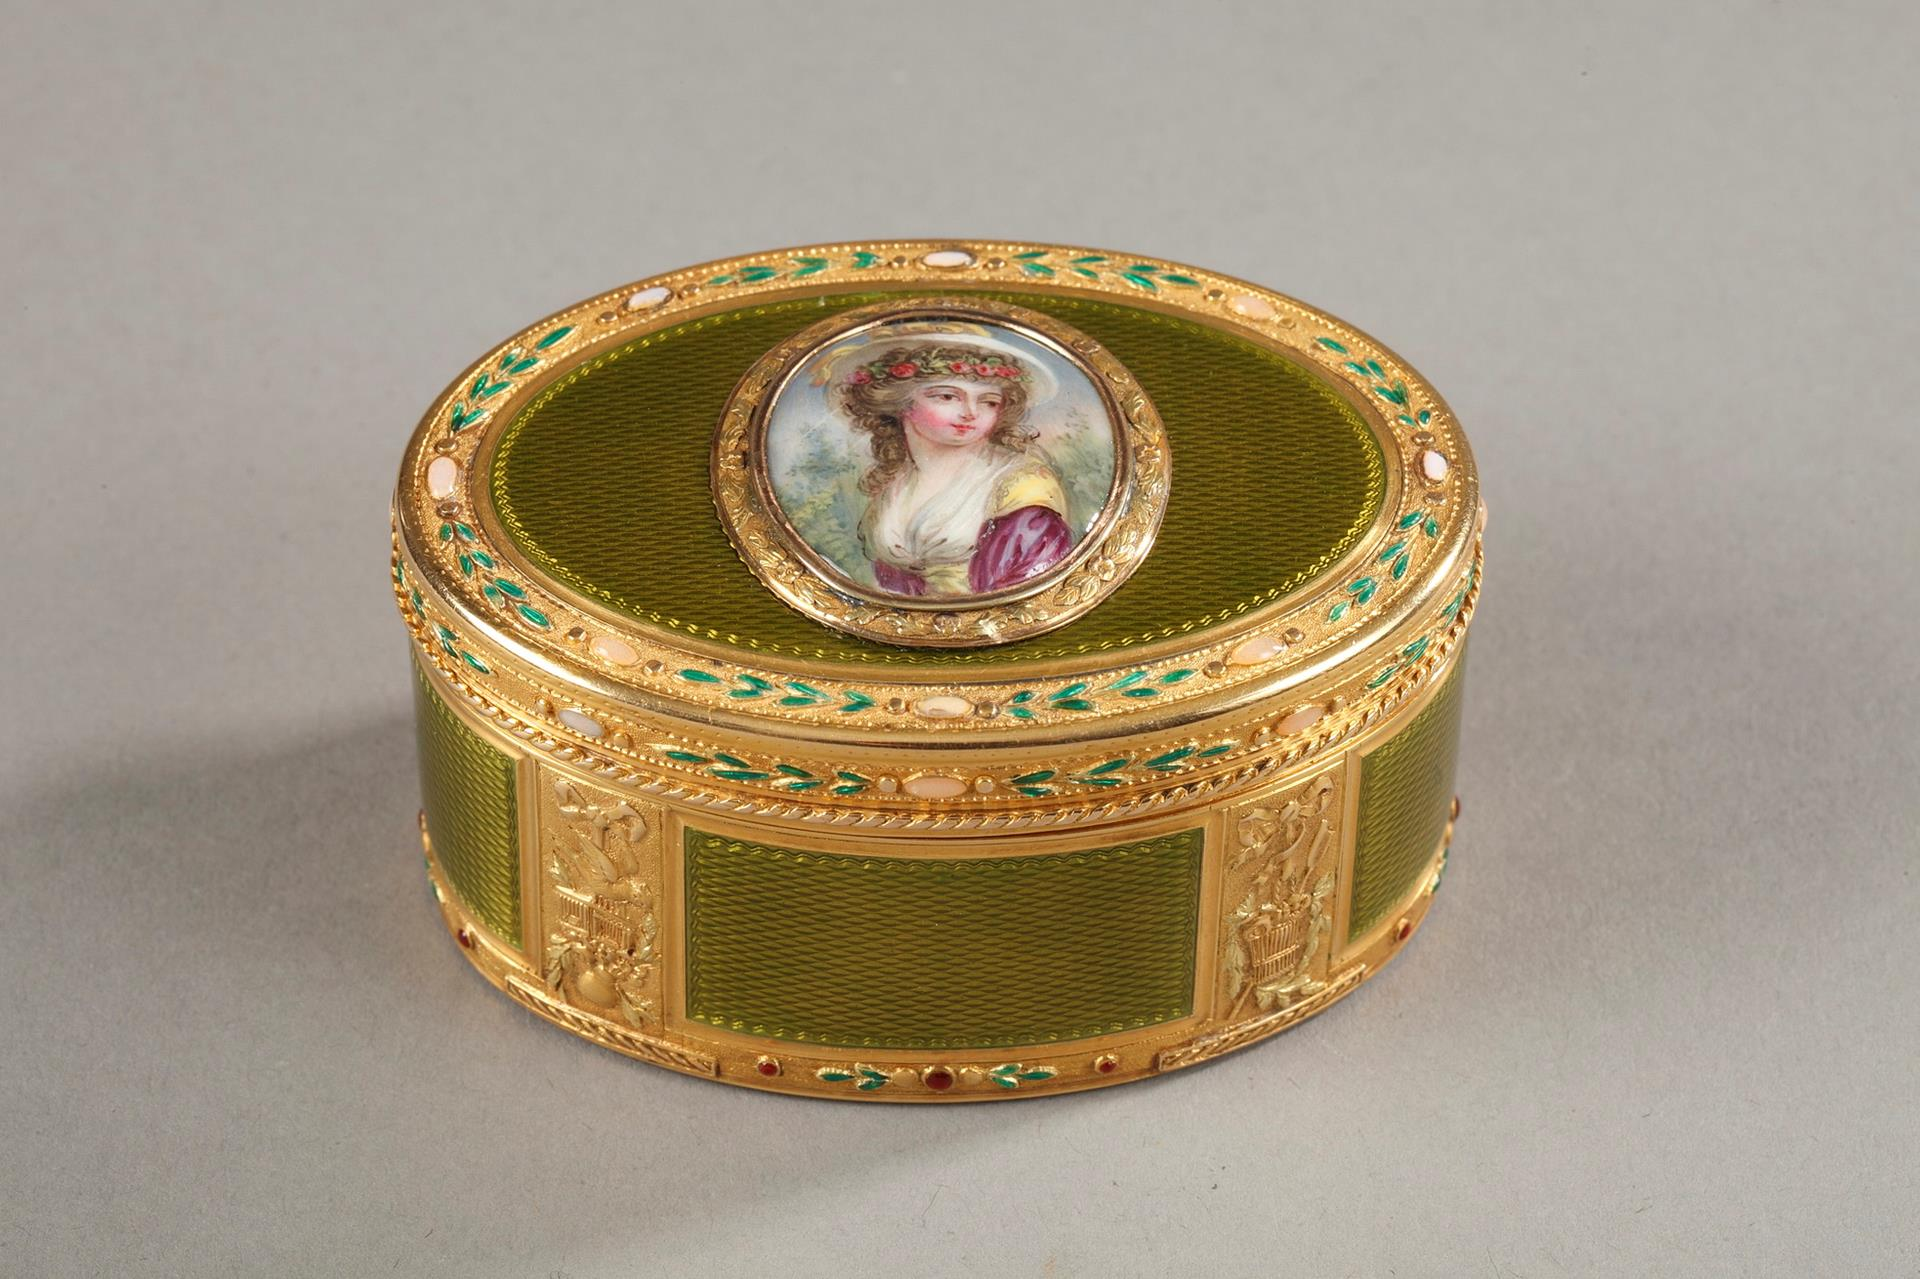 Gold and enamel snuff box. 18th century.